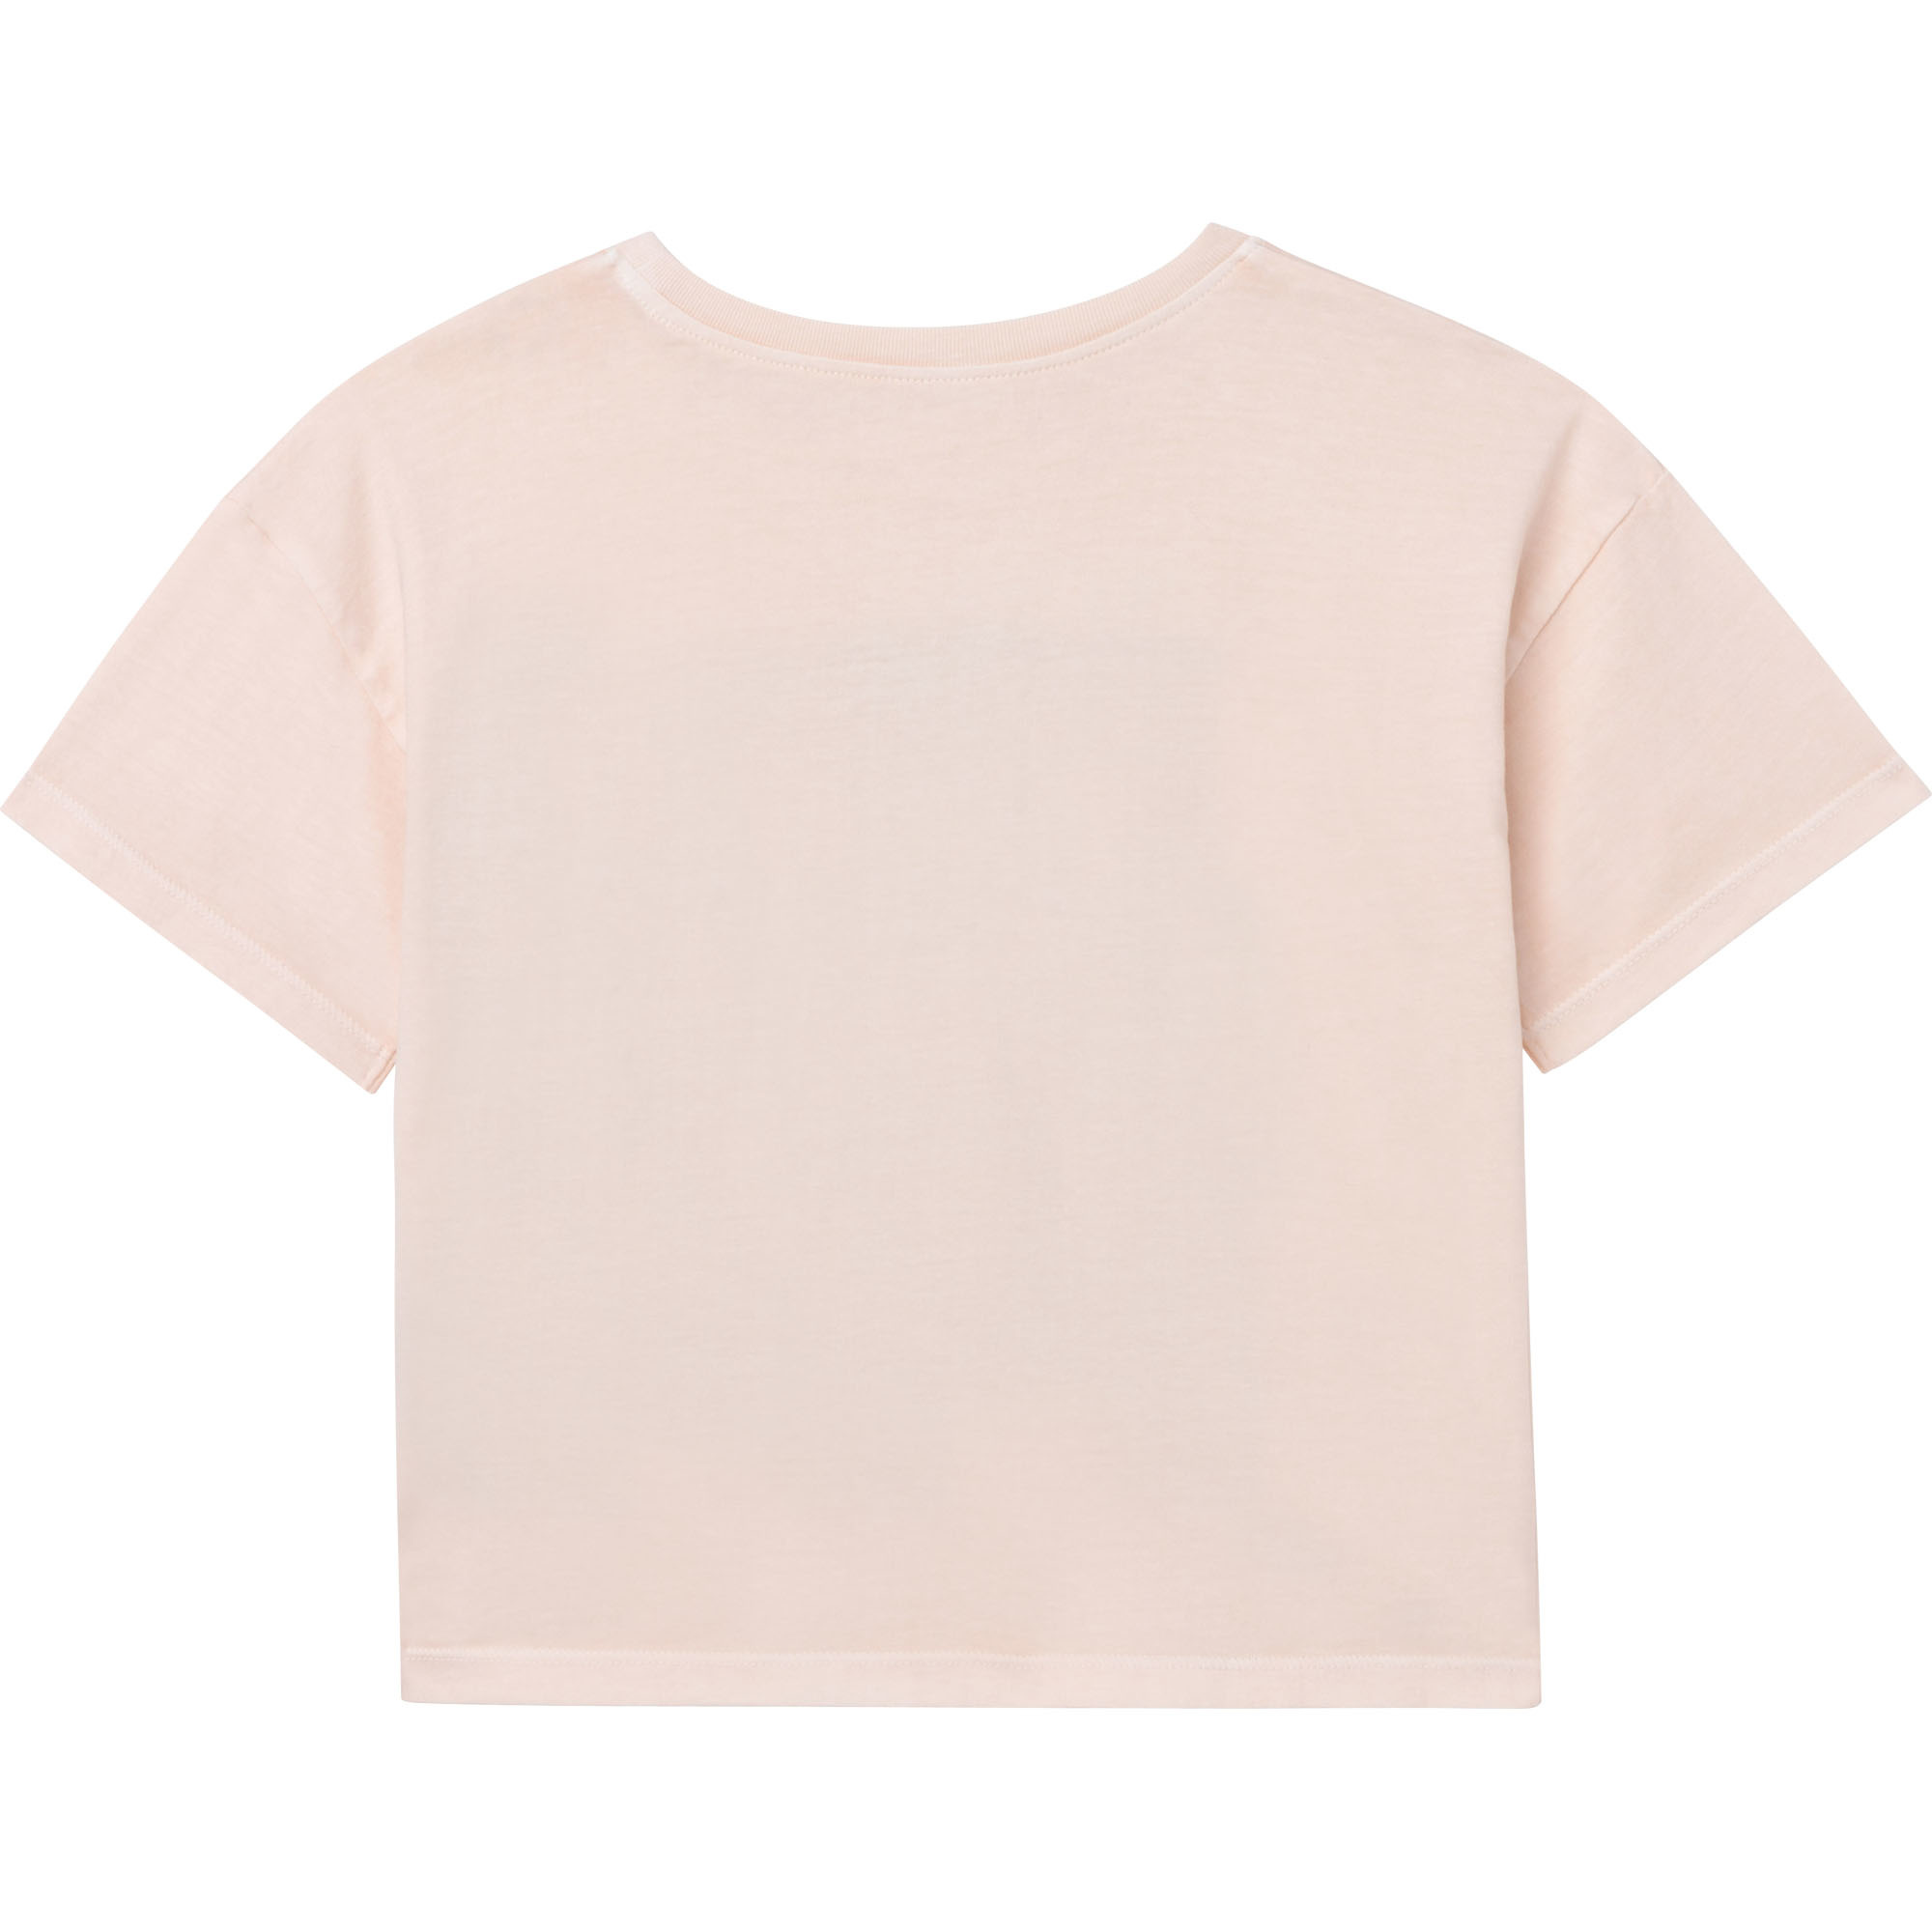 ZADIG&VOLTAIRE t-shirt manches courtes-2